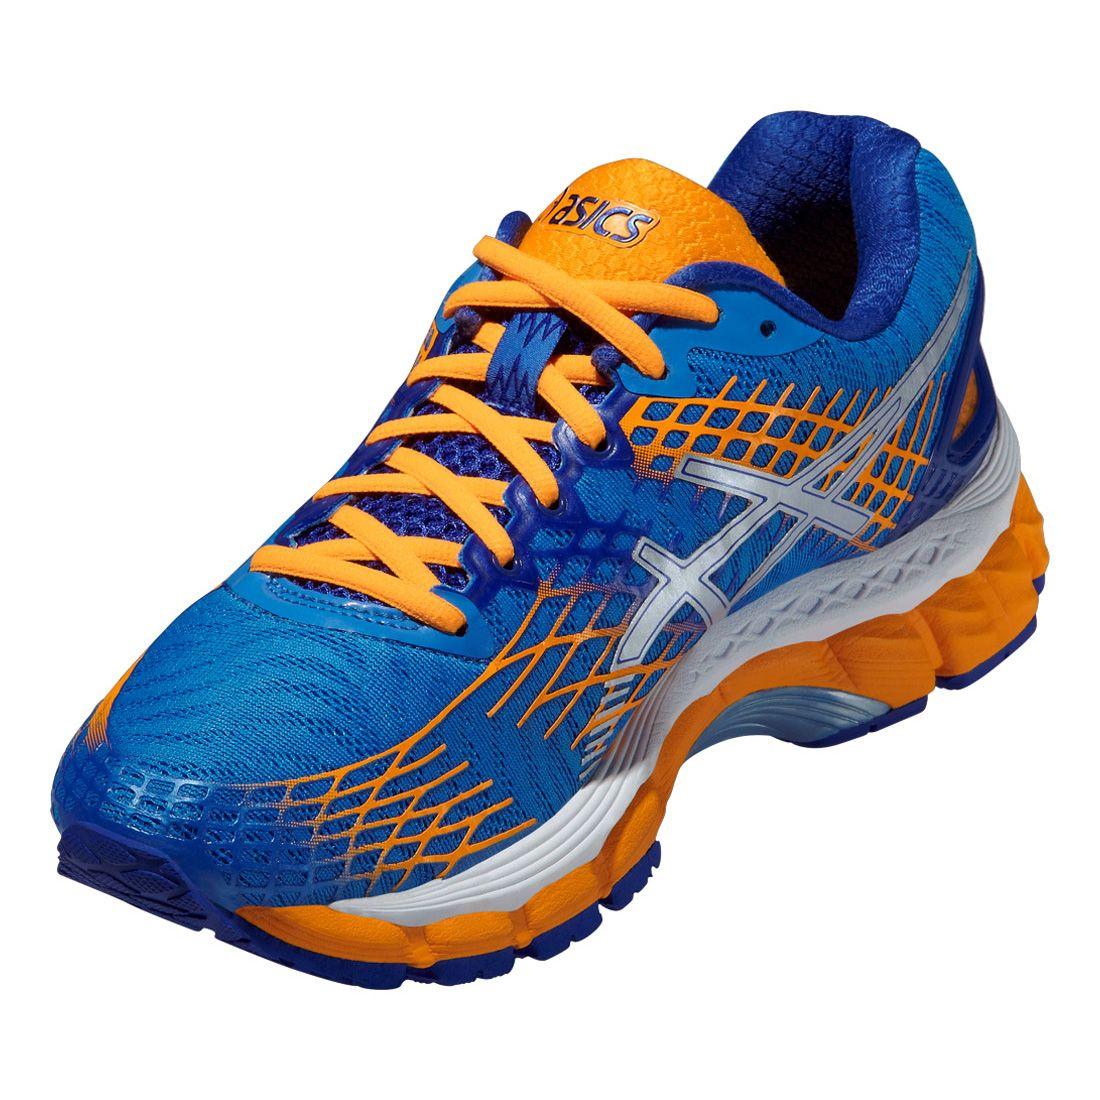 Asics Gel-Nimbus 17 Ladies Running Shoes - Sweatband.com